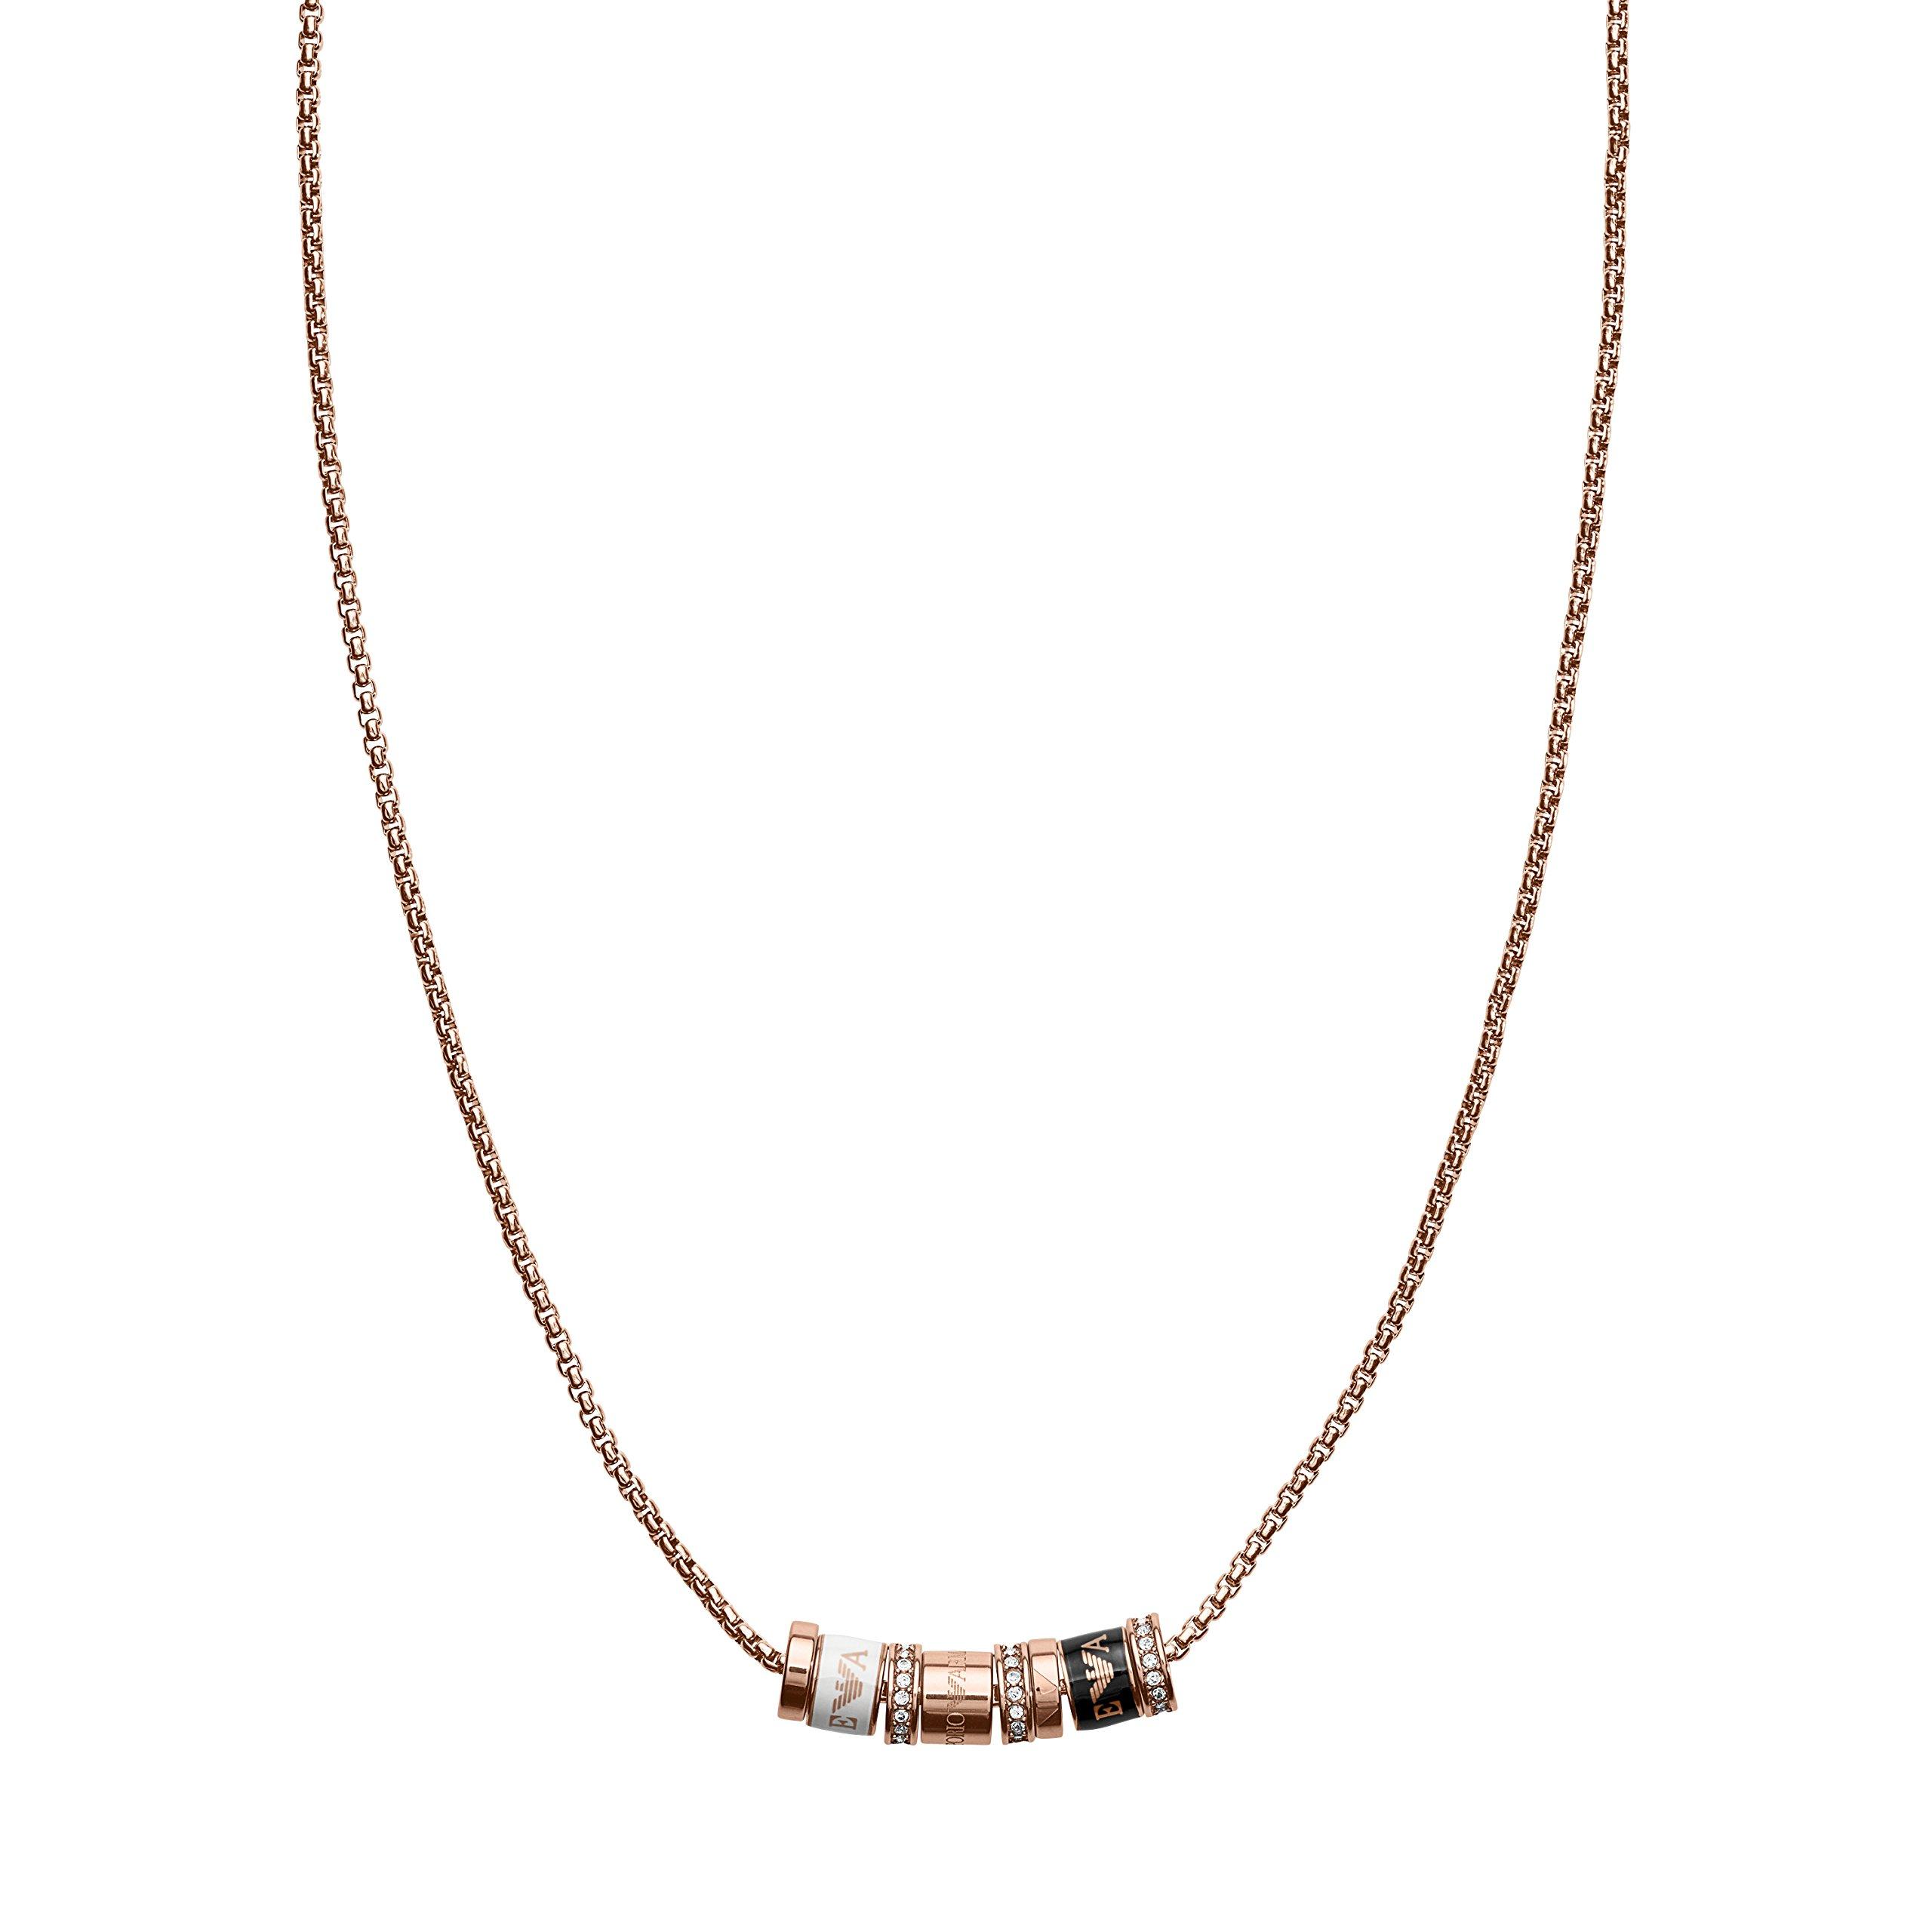 Damen - Halskette Edelstahl